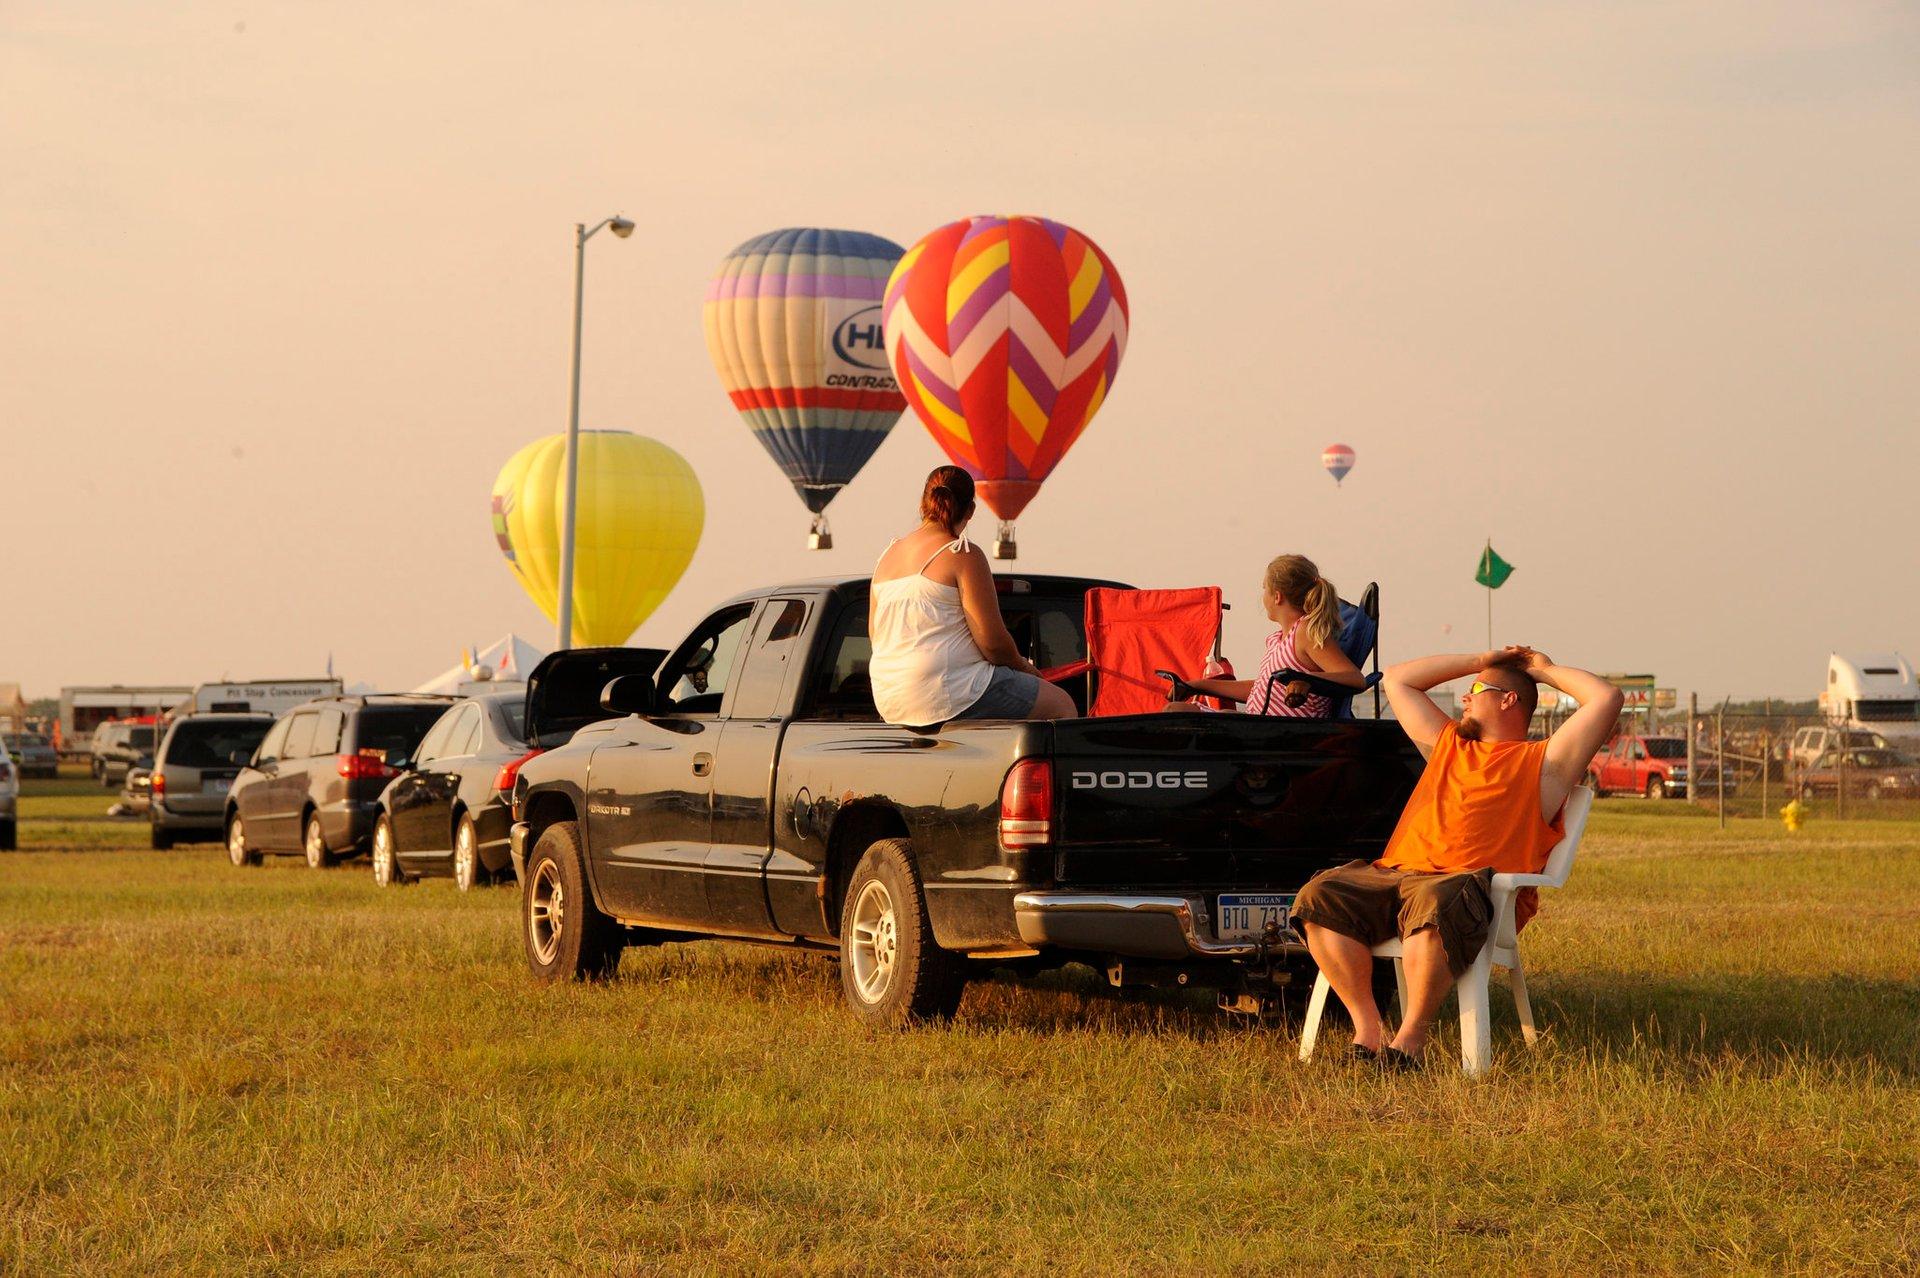 Battle Creek Field of Flight Air Show & Balloon Festival in Midwest 2020 - Best Time